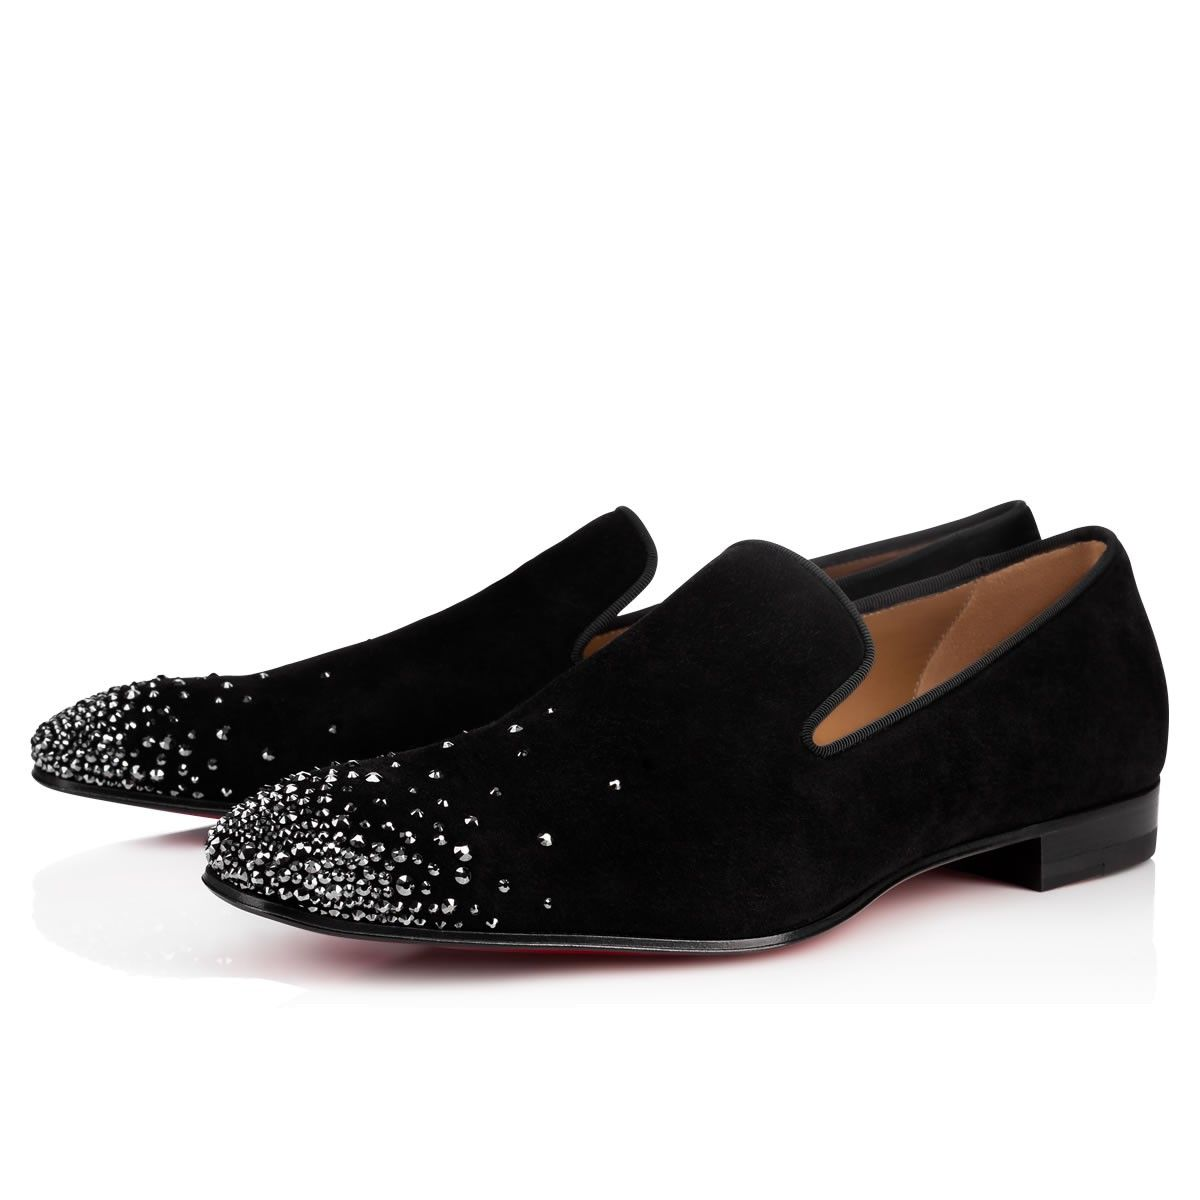 d1920844997 CHRISTIAN LOUBOUTIN .  christianlouboutin  shoes